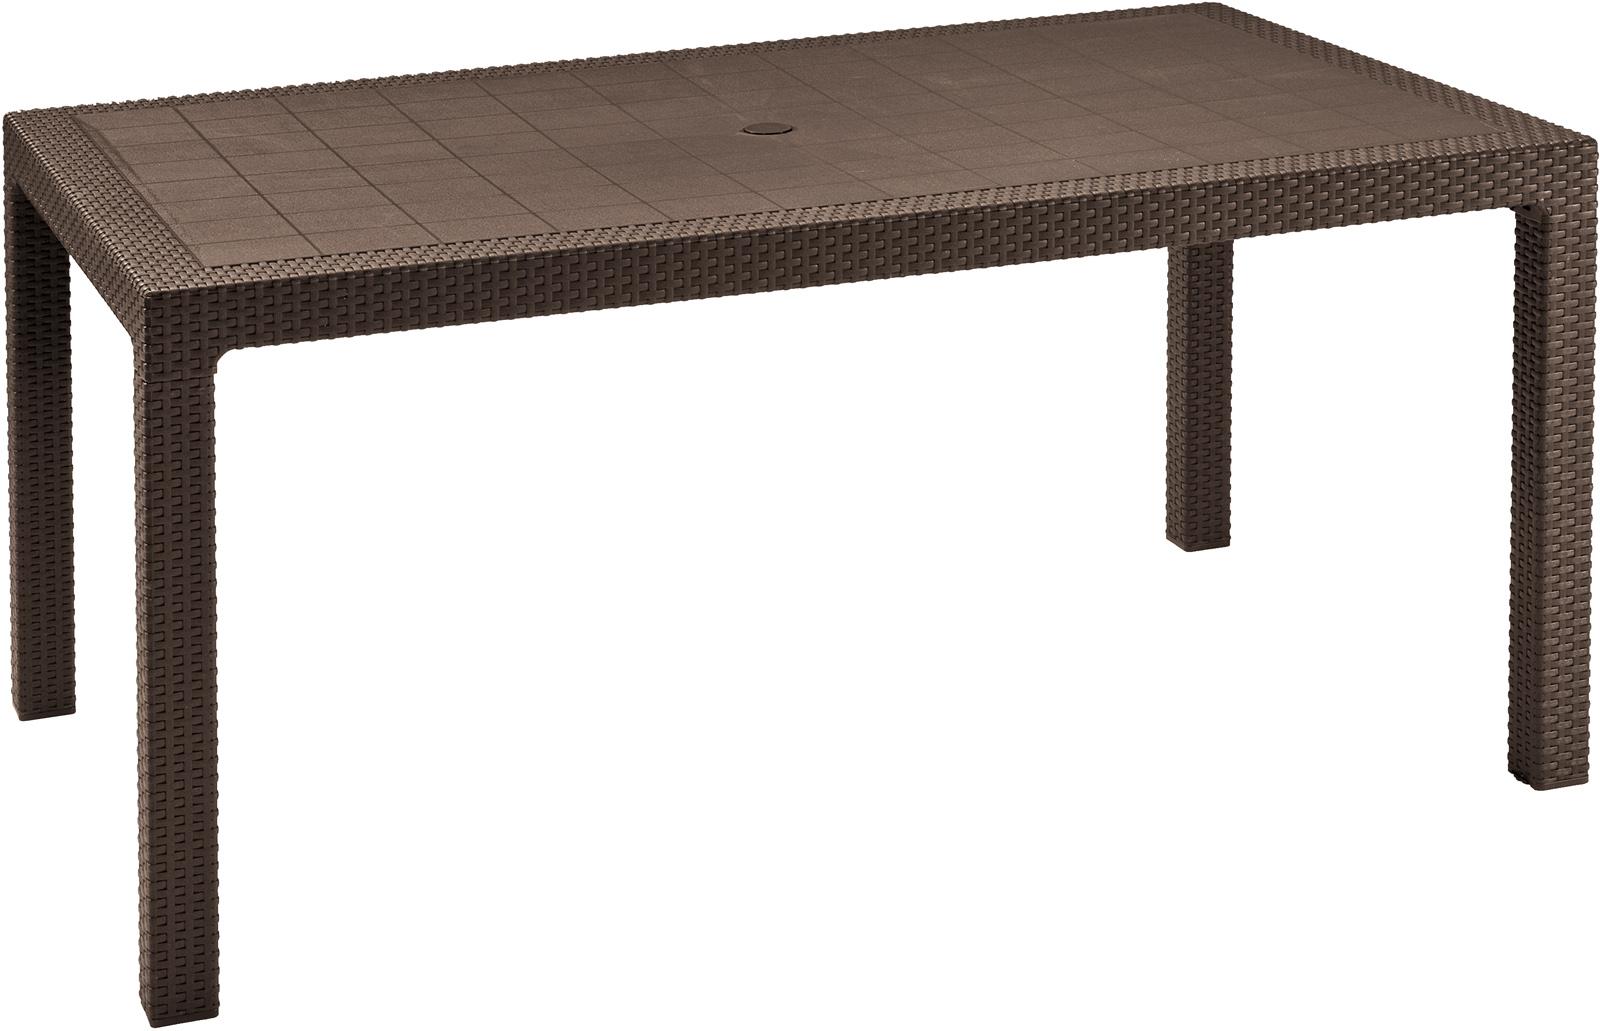 Záhradný stôl - Allibert - Melody brown